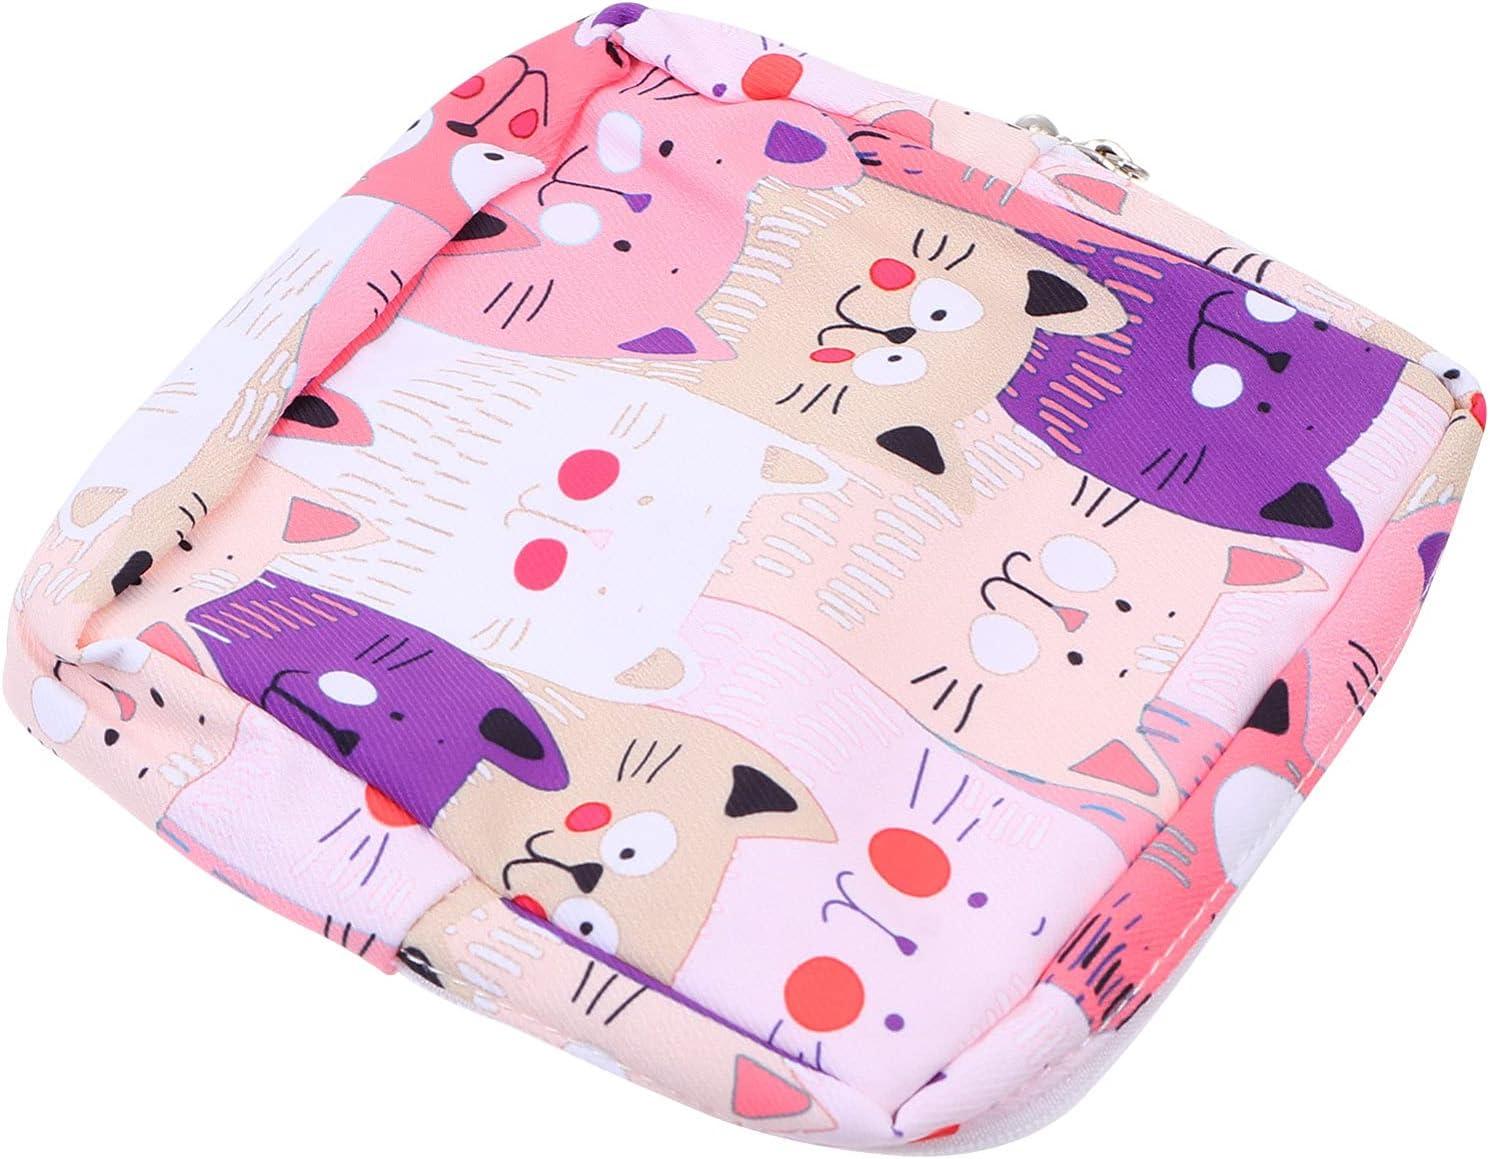 ARTIBETTER Courier shipping free 1 Pcs Sanitary Napkin Printed Menstru Ranking TOP4 Storage Bag Cat